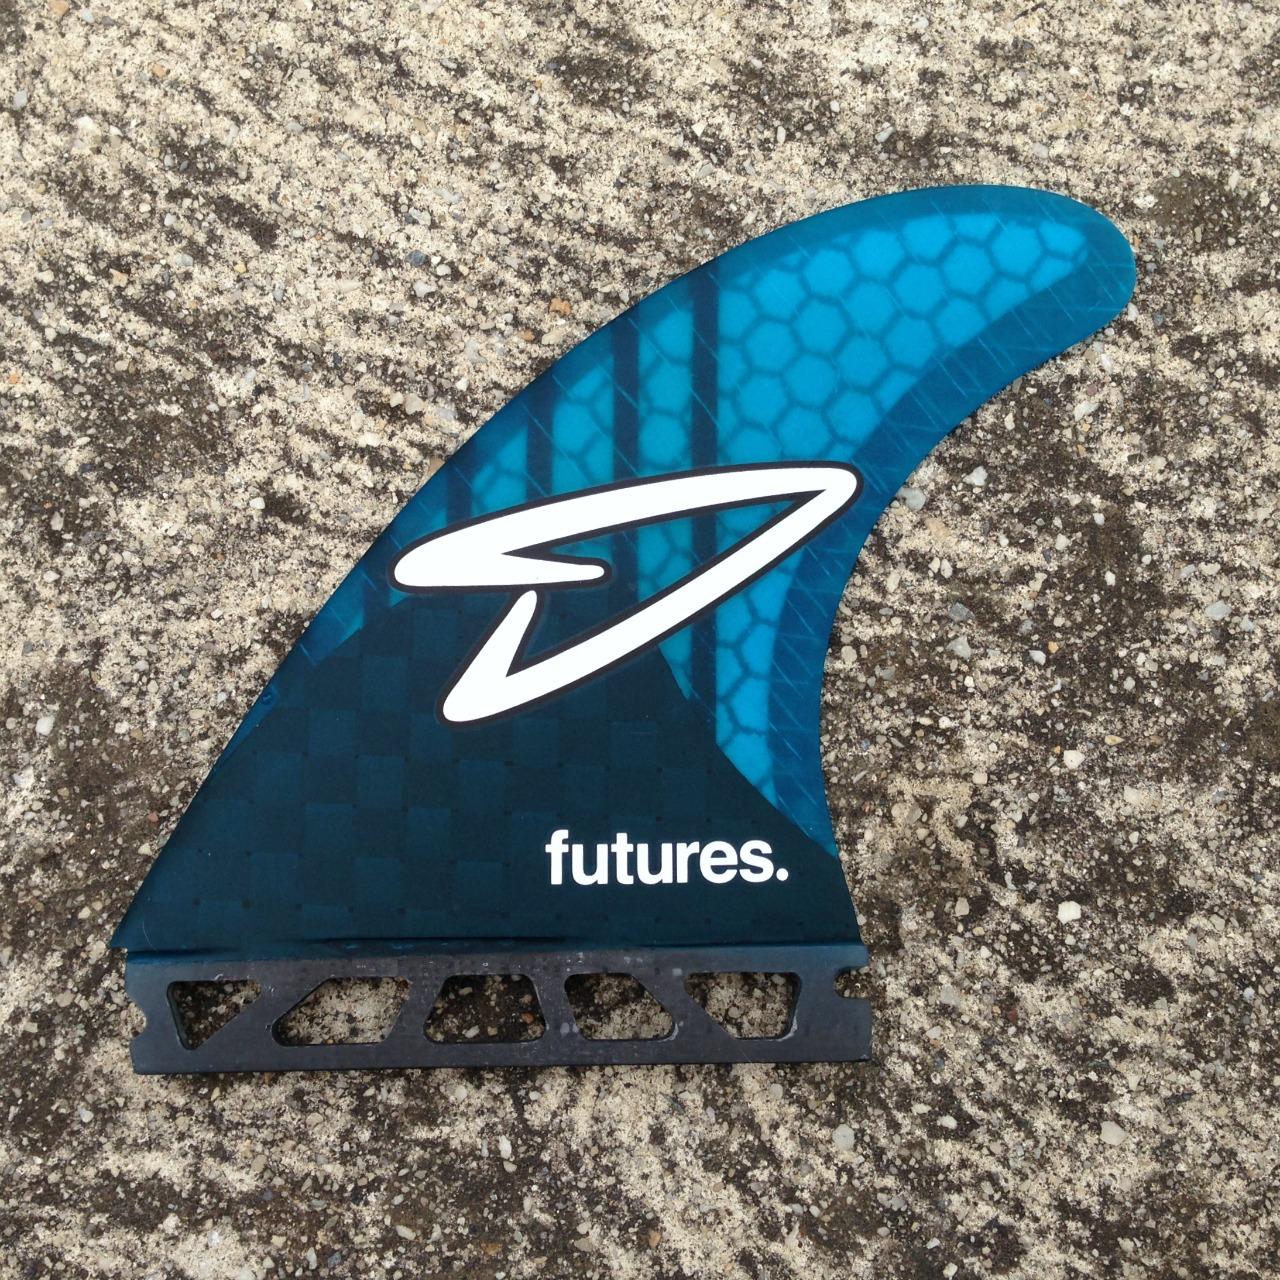 Futures Generation Series Fins